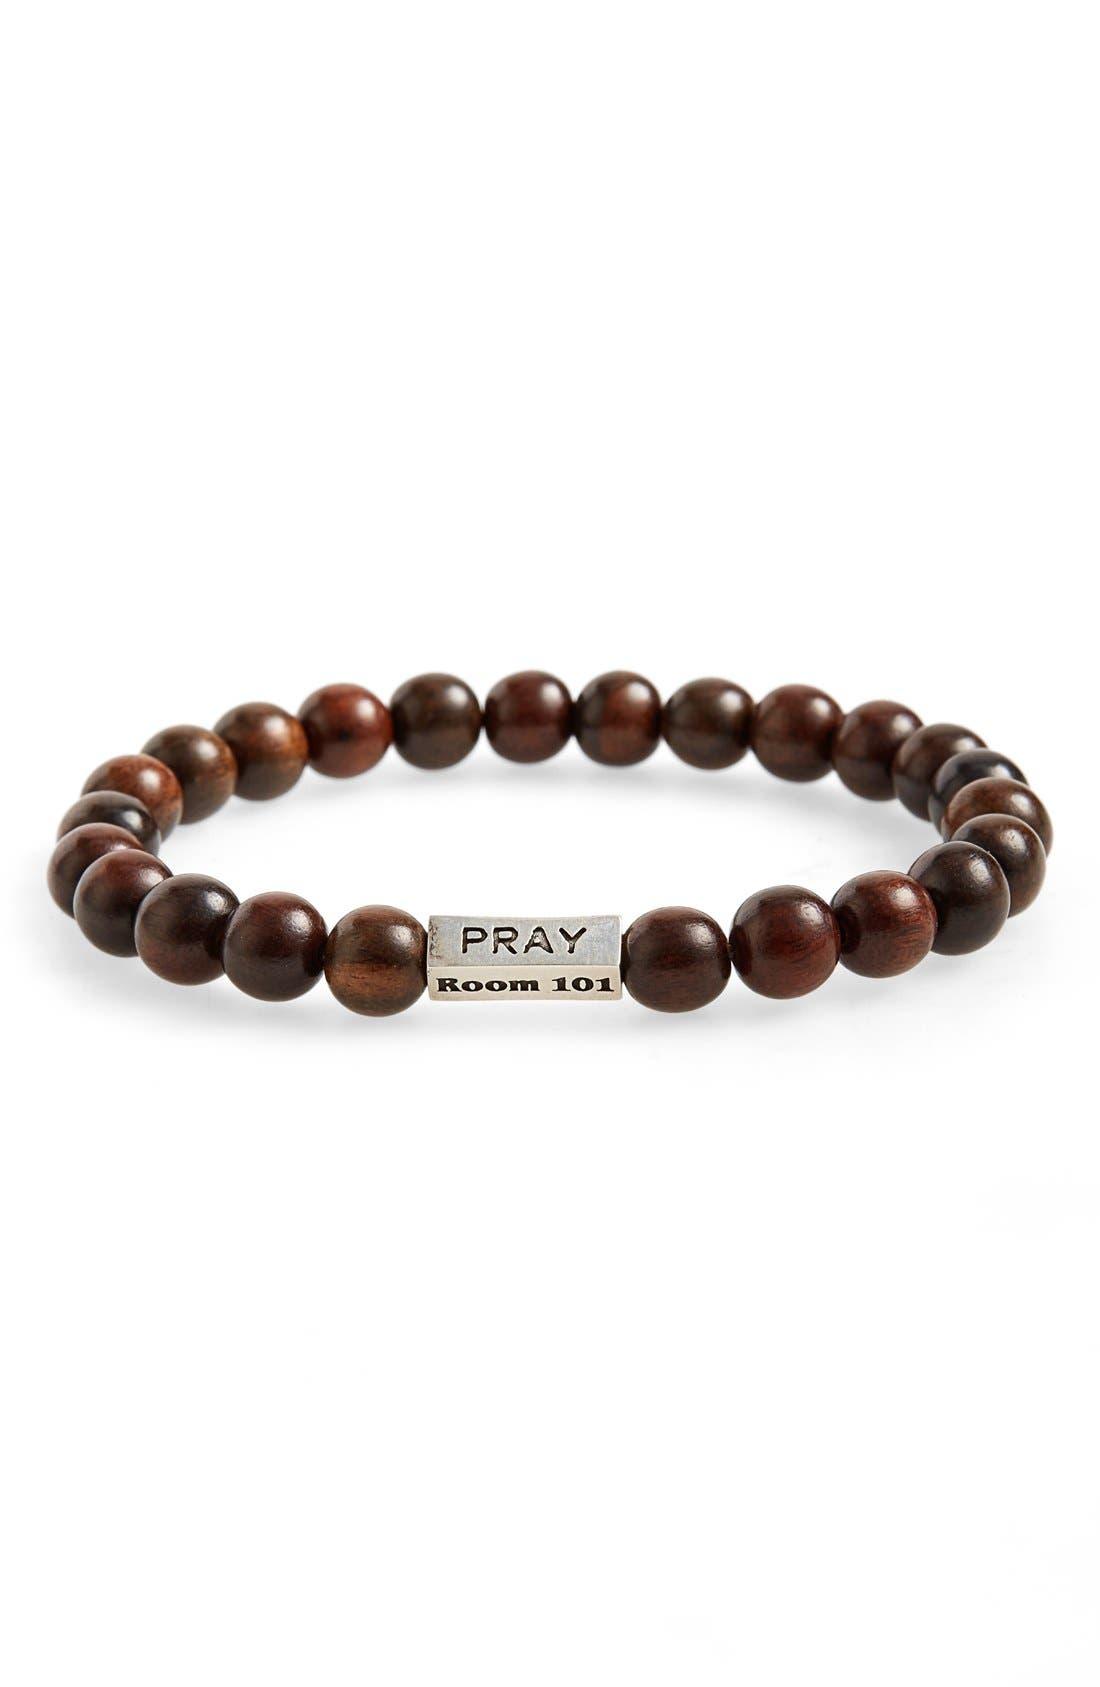 Alternate Image 1 Selected - Room 101 Wood Bead Bracelet